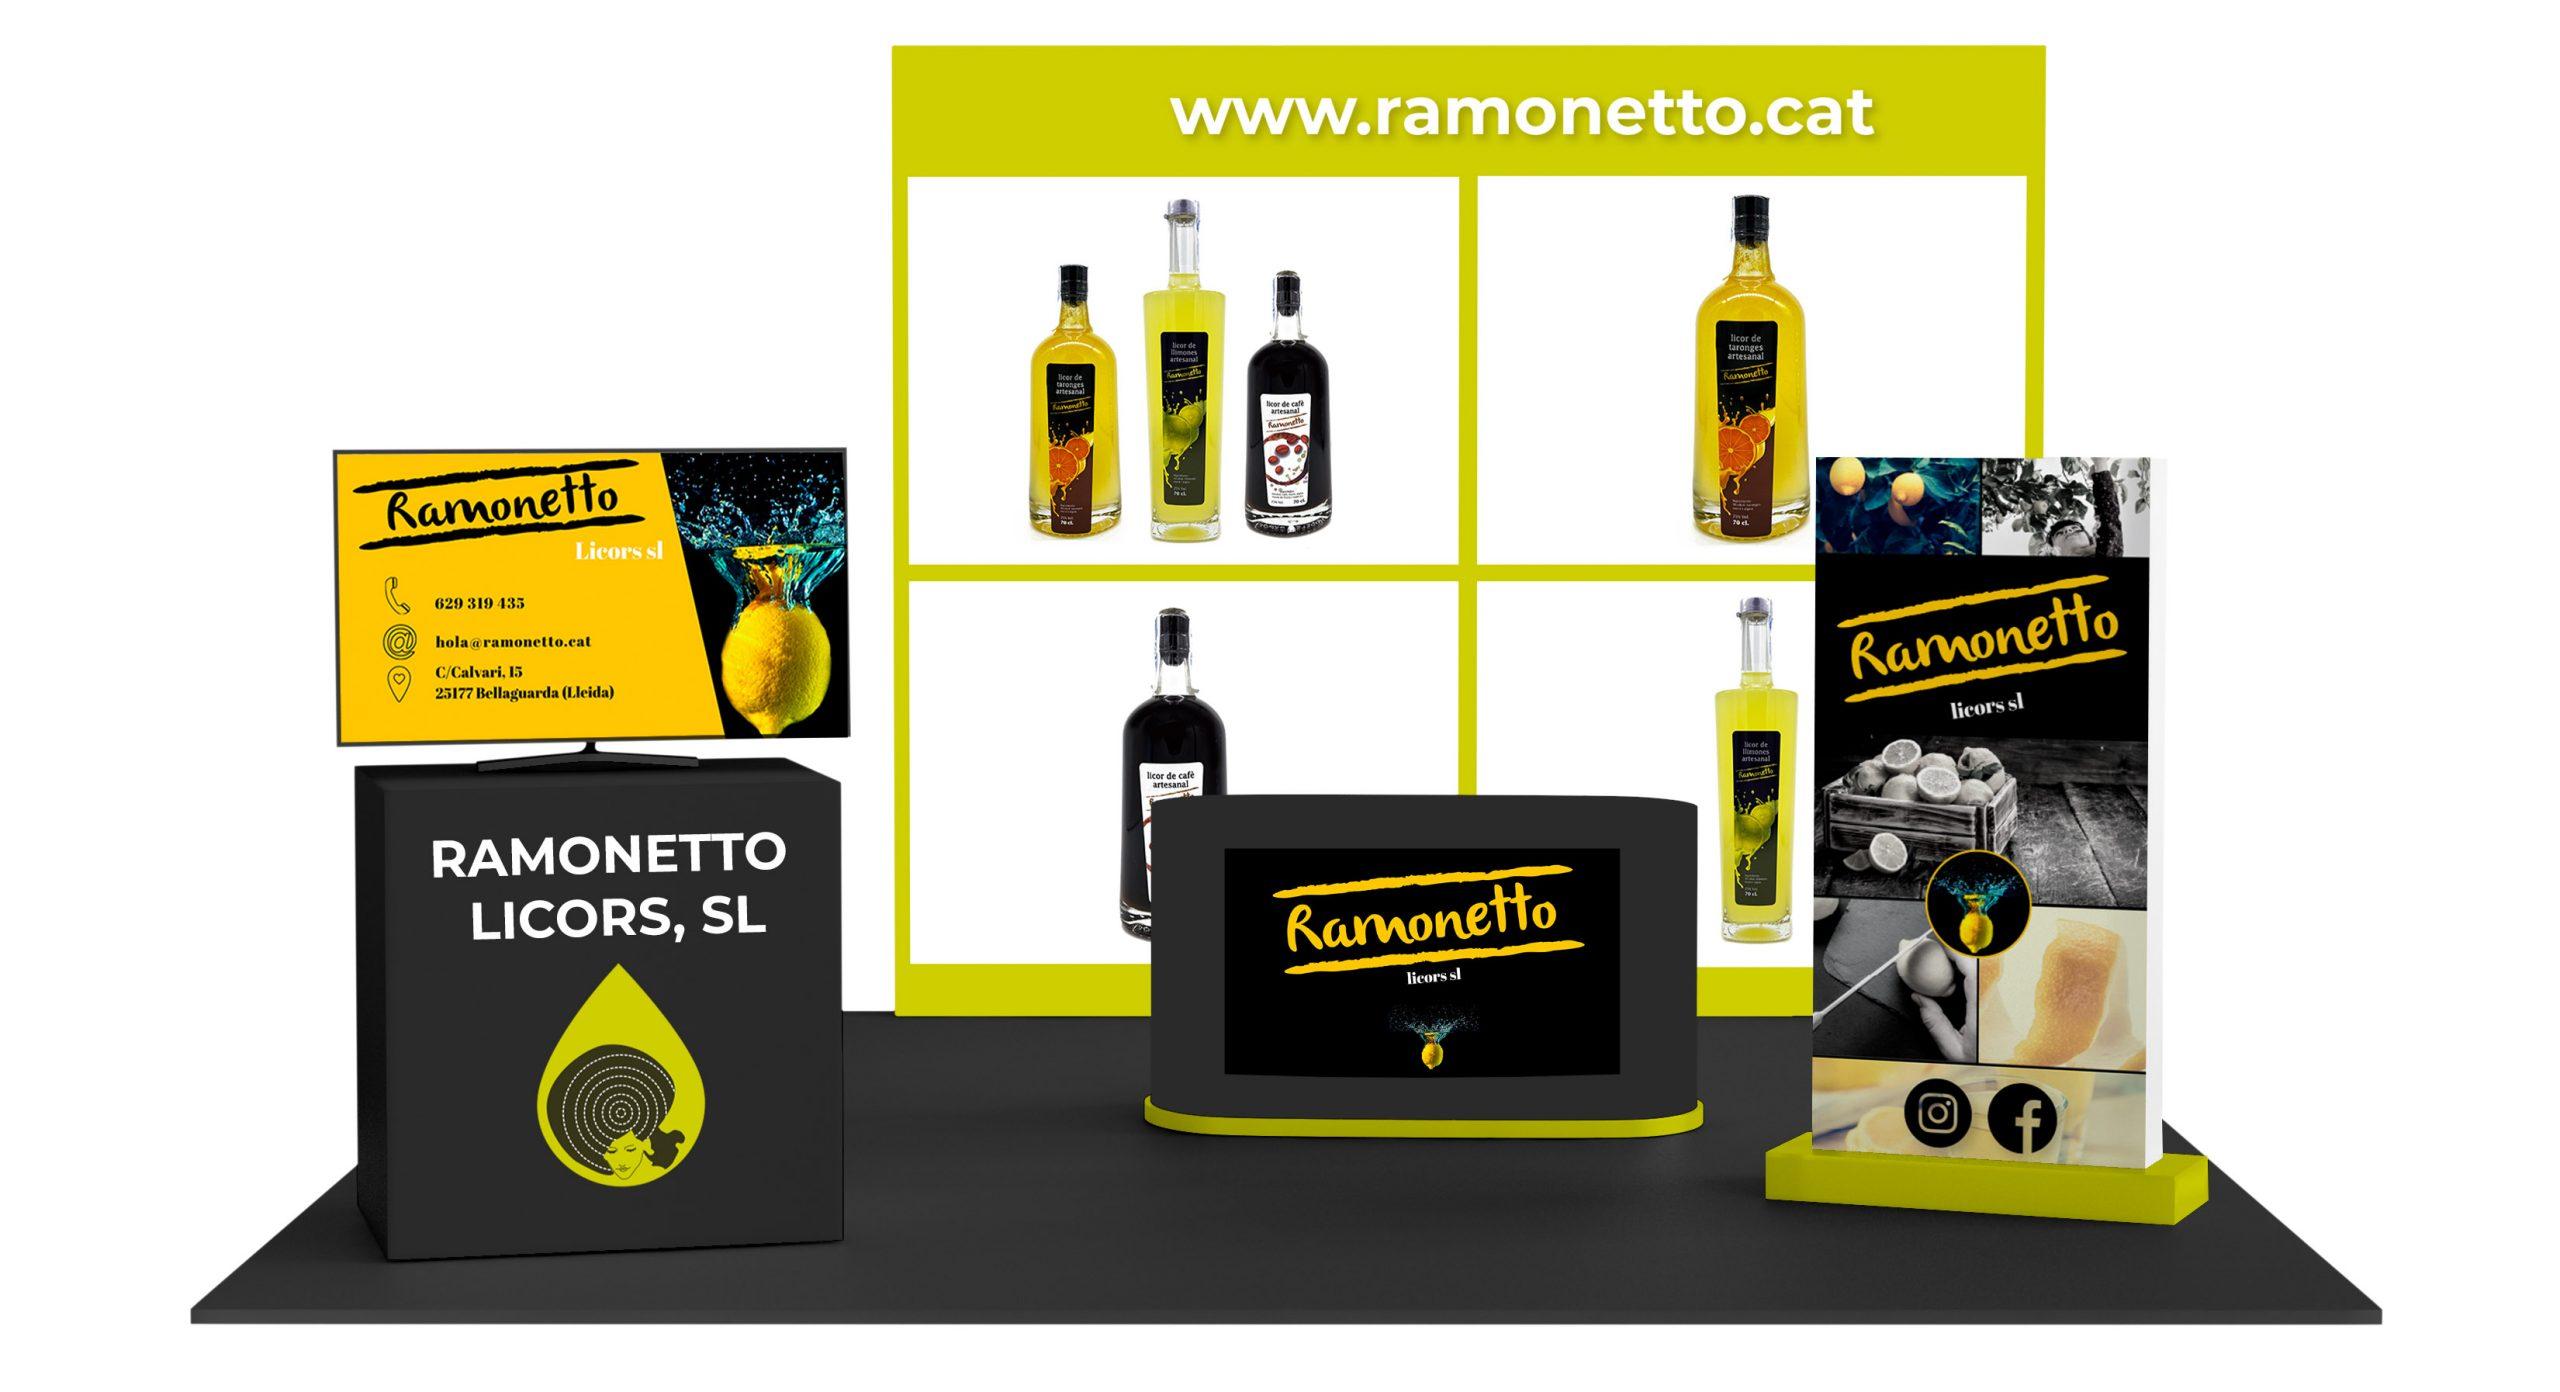 Ramonnetto